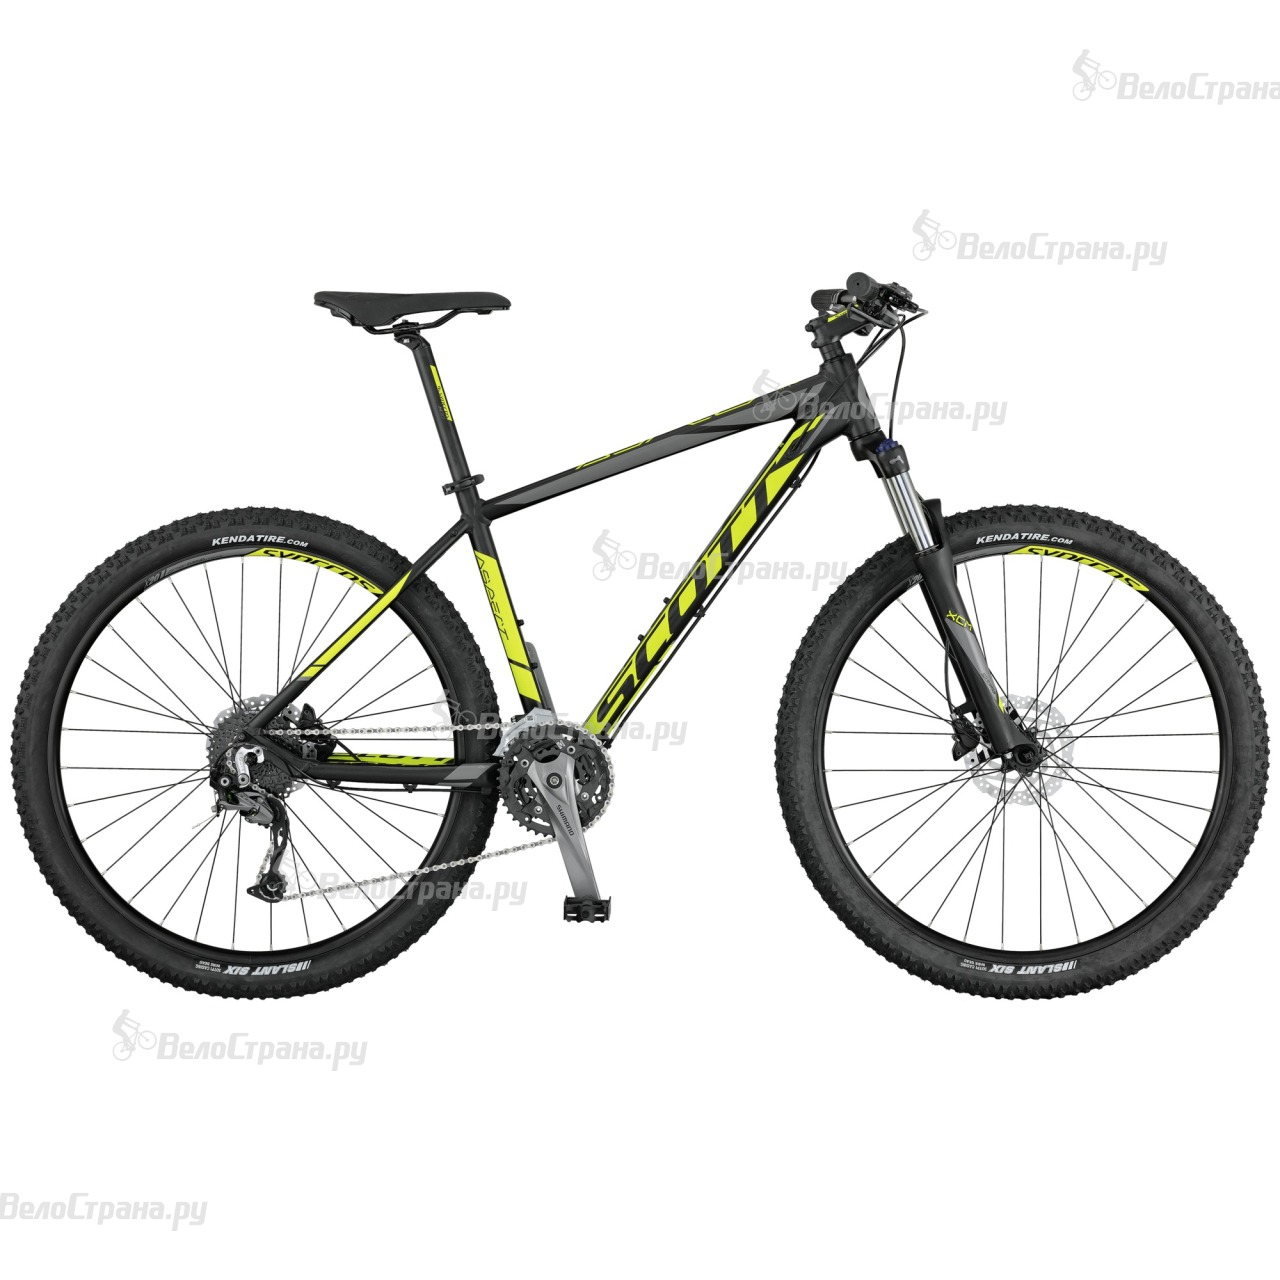 Велосипед Scott Aspect 940 (2017) велосипед scott aspect 940 29 2016